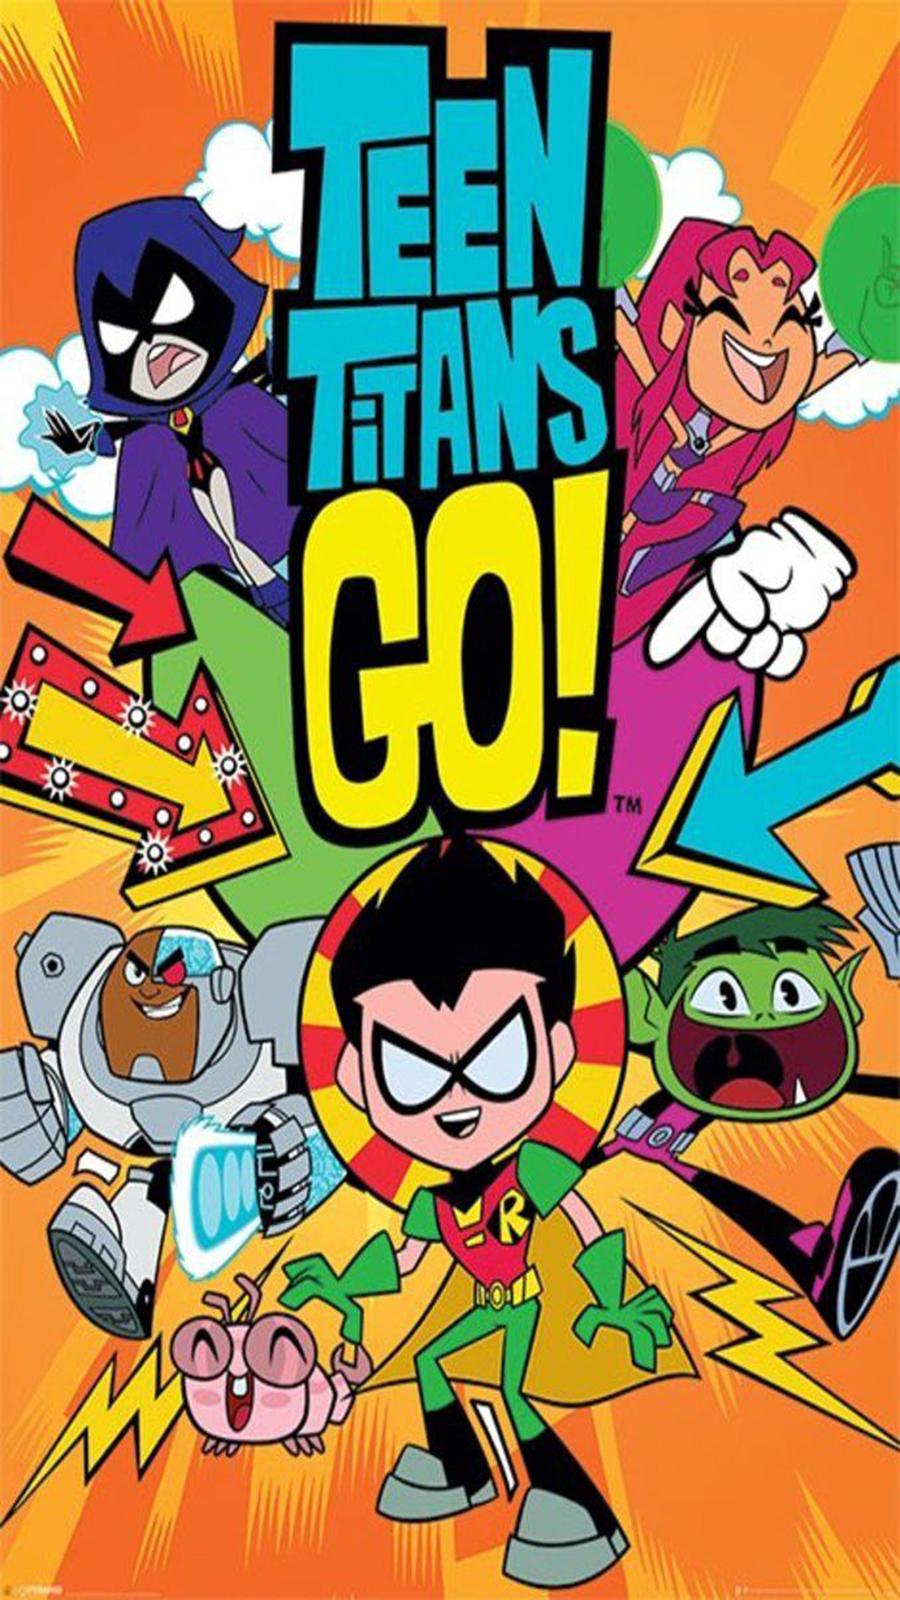 Teen Titans Go Wallpaper For Mobile – Cartoon Wallpapers